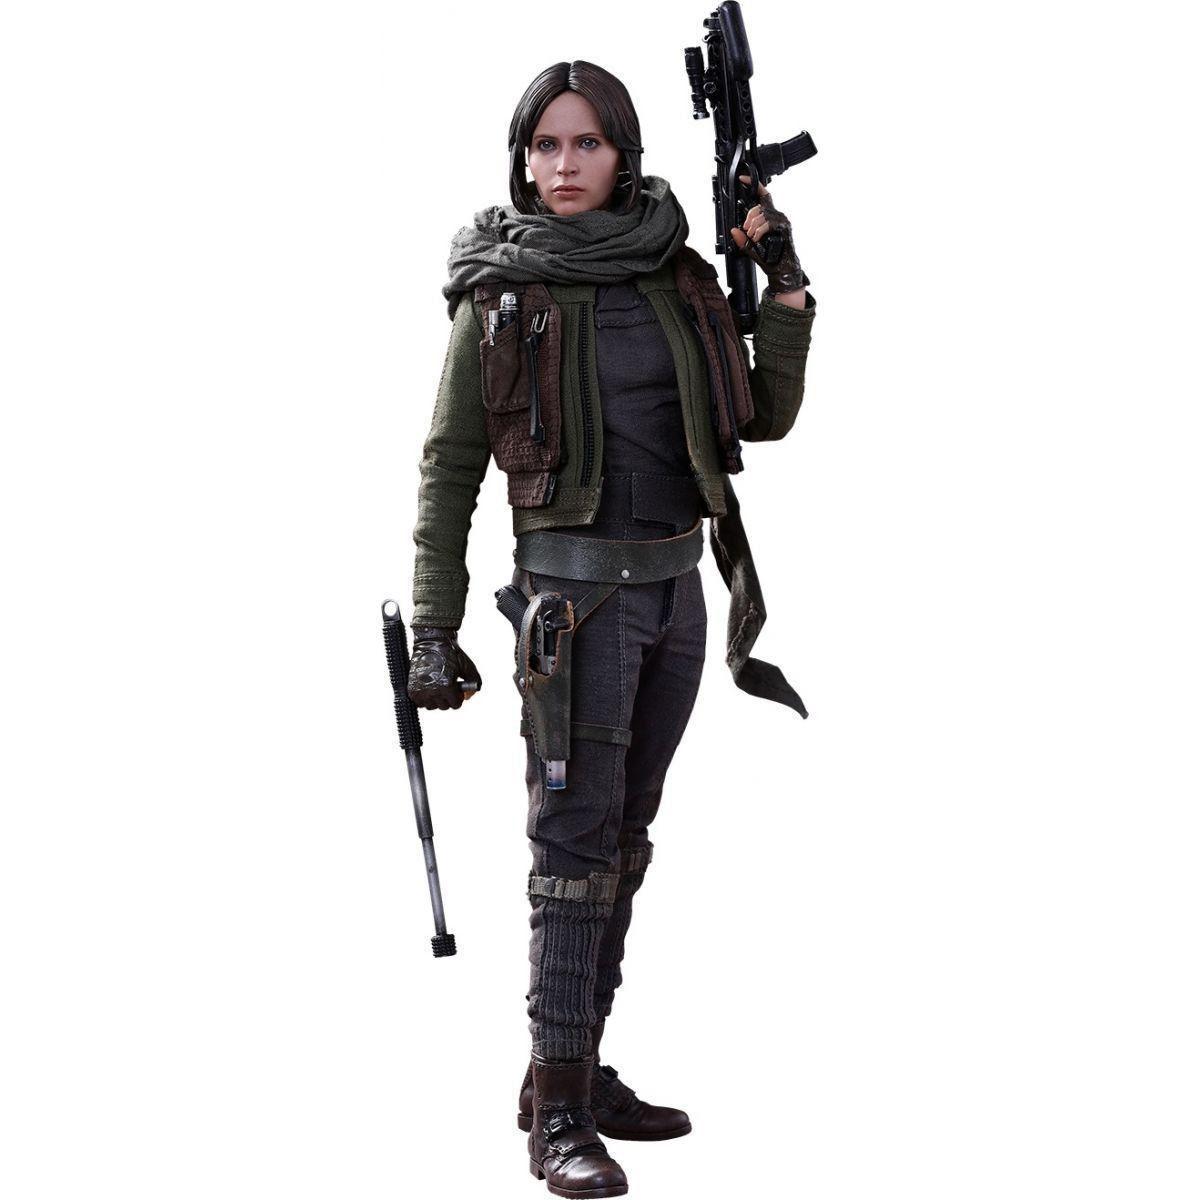 Action Figure Jyn Erso: Rogue One Uma História Star Wars (MMS404) Escala 1/6 - Hot Toys